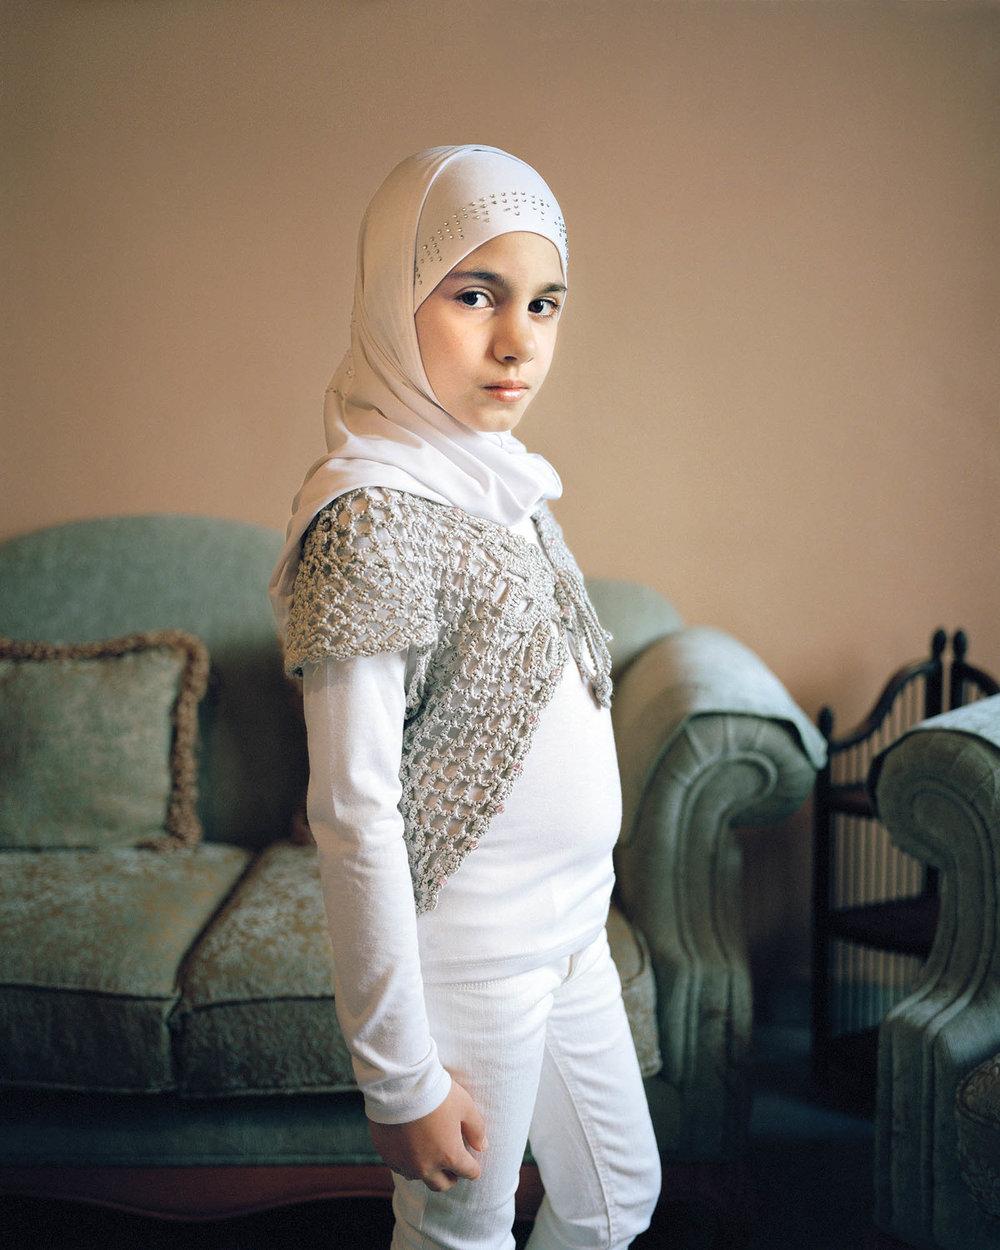 Maryam 9, Beirut Lebanon - Digital Photograph, 2011, © Rania Matar